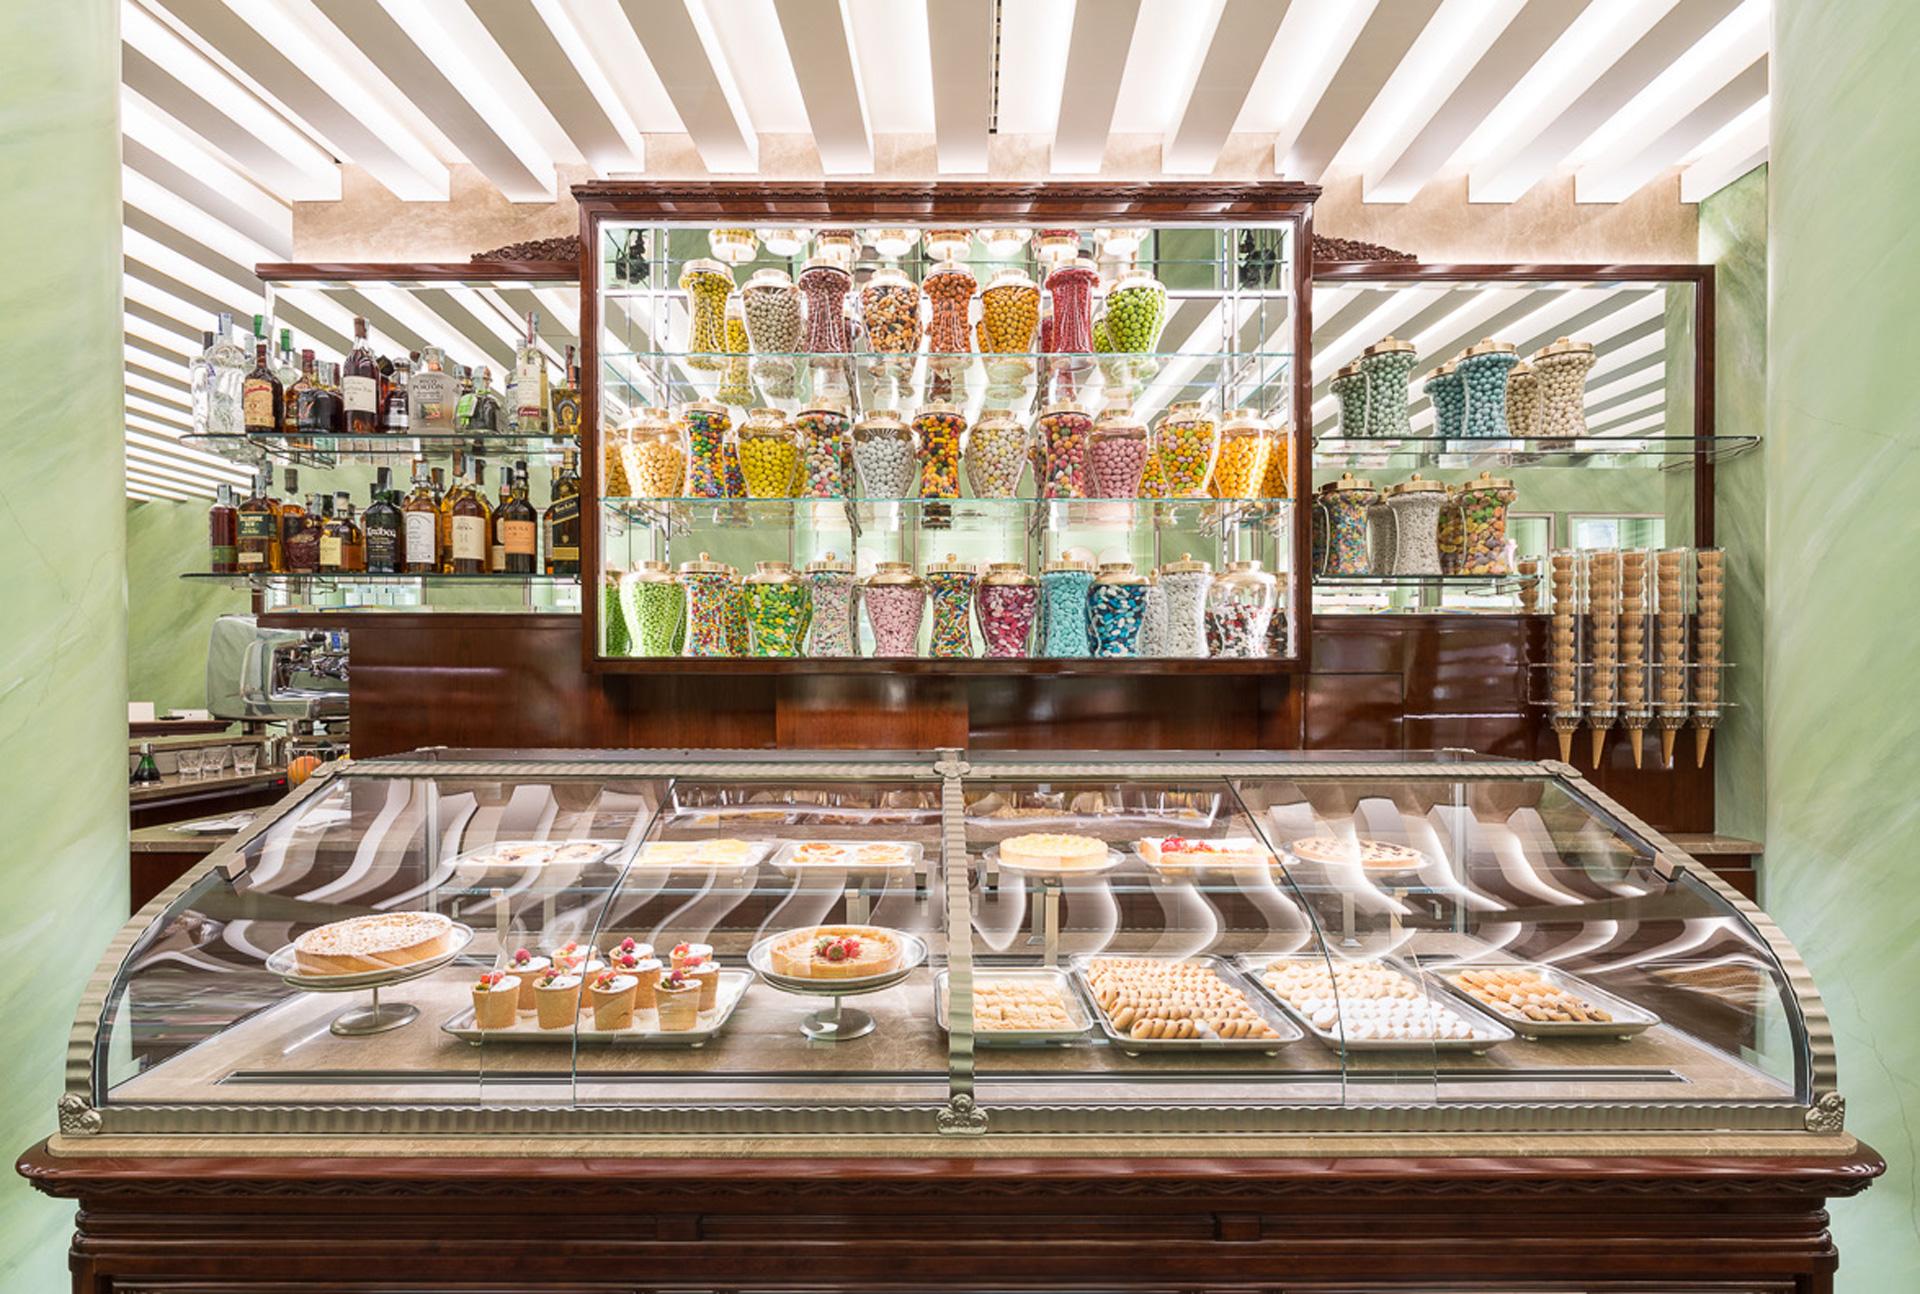 Sweetmeats to take away at Caffè Marchesi in Milan